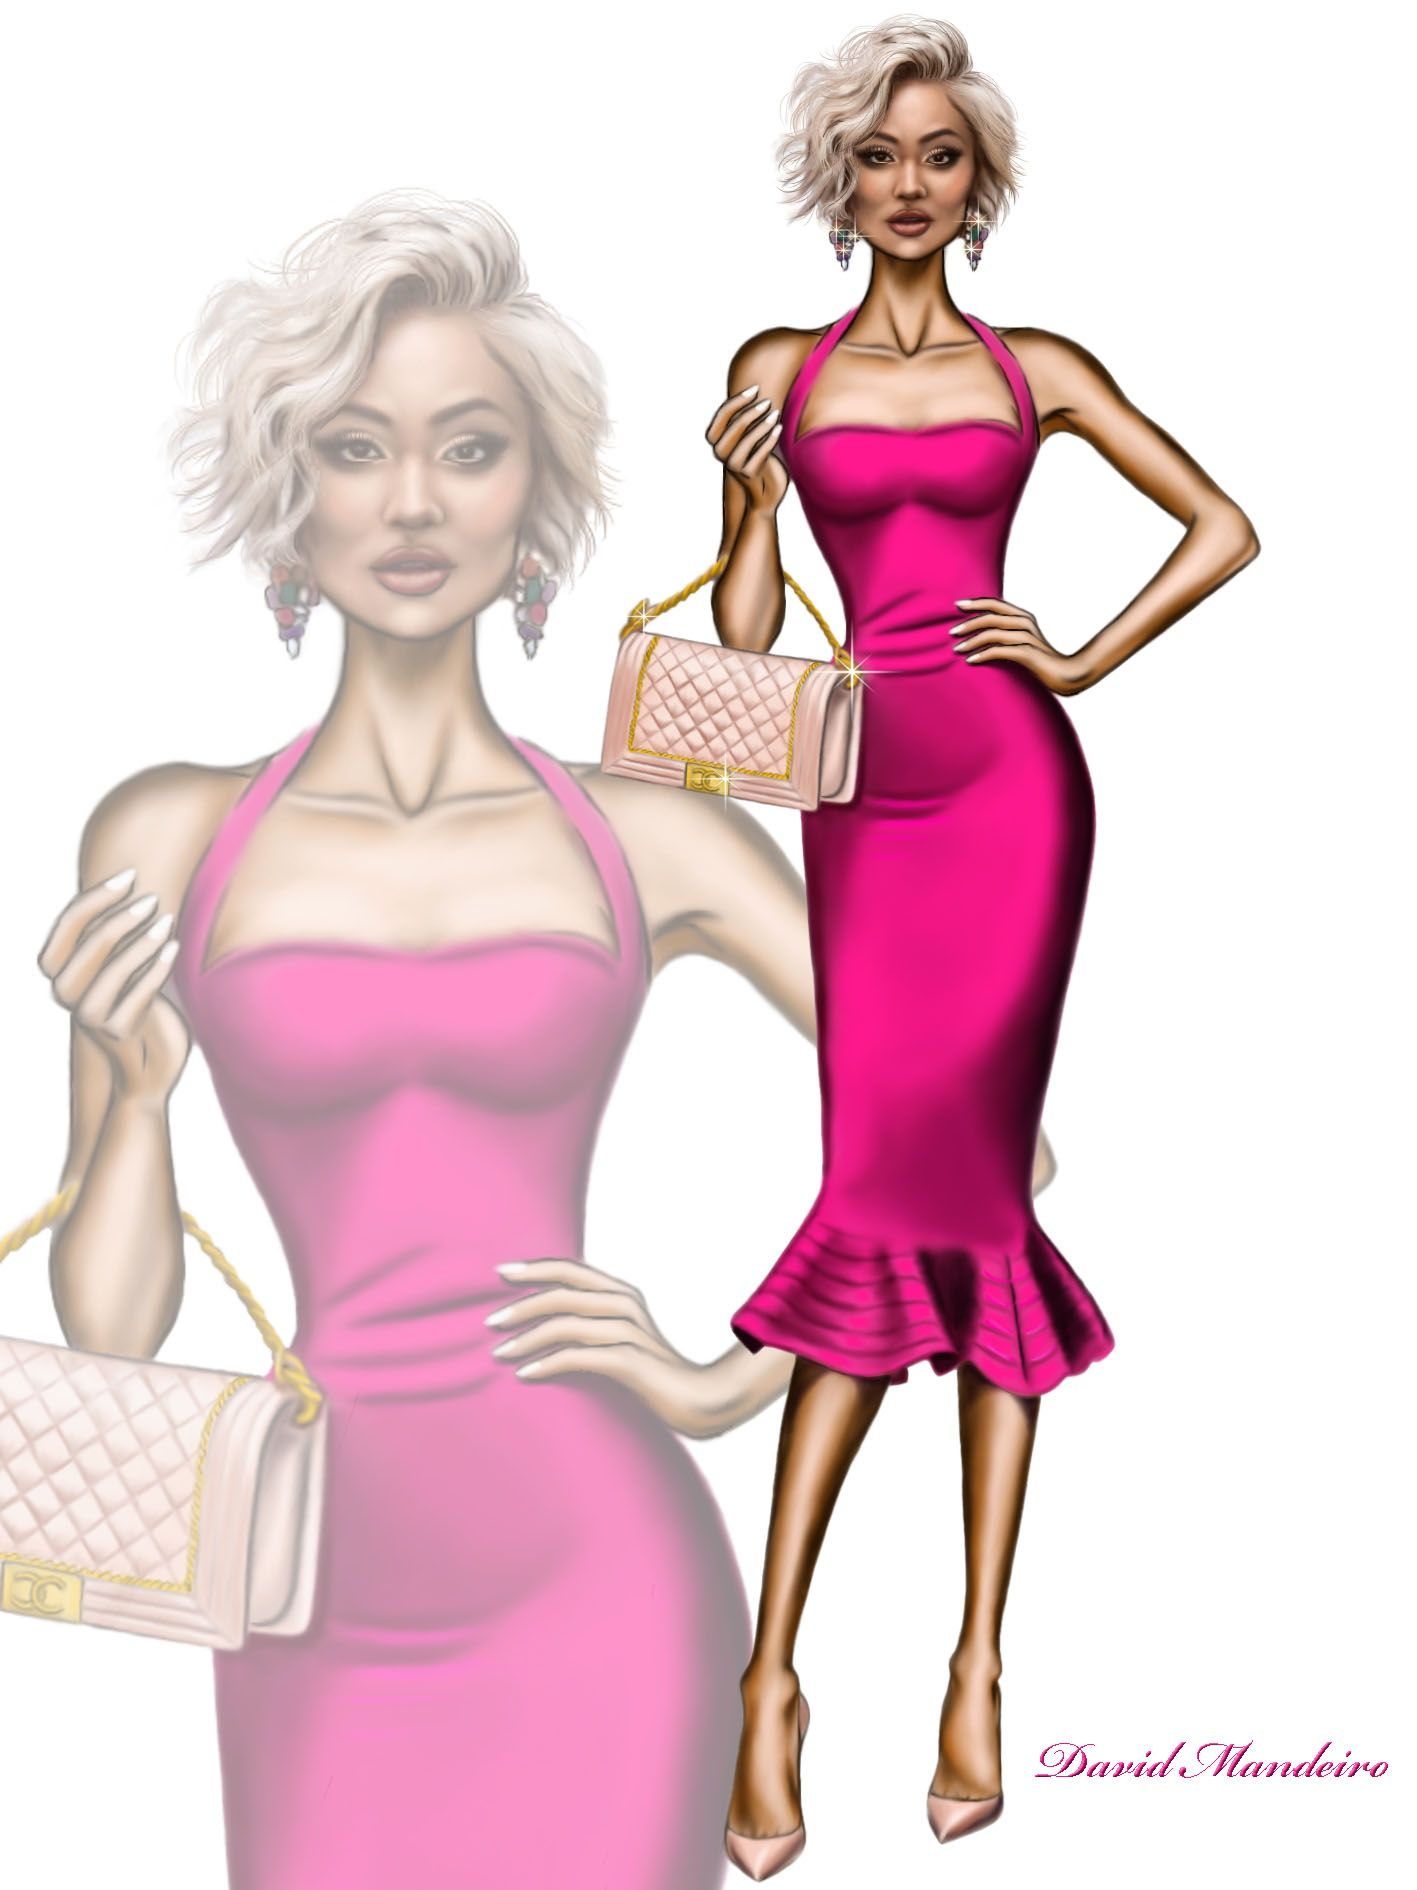 Imagen relacionada | Fashion sketches | Pinterest | Figurin, Bocetos ...